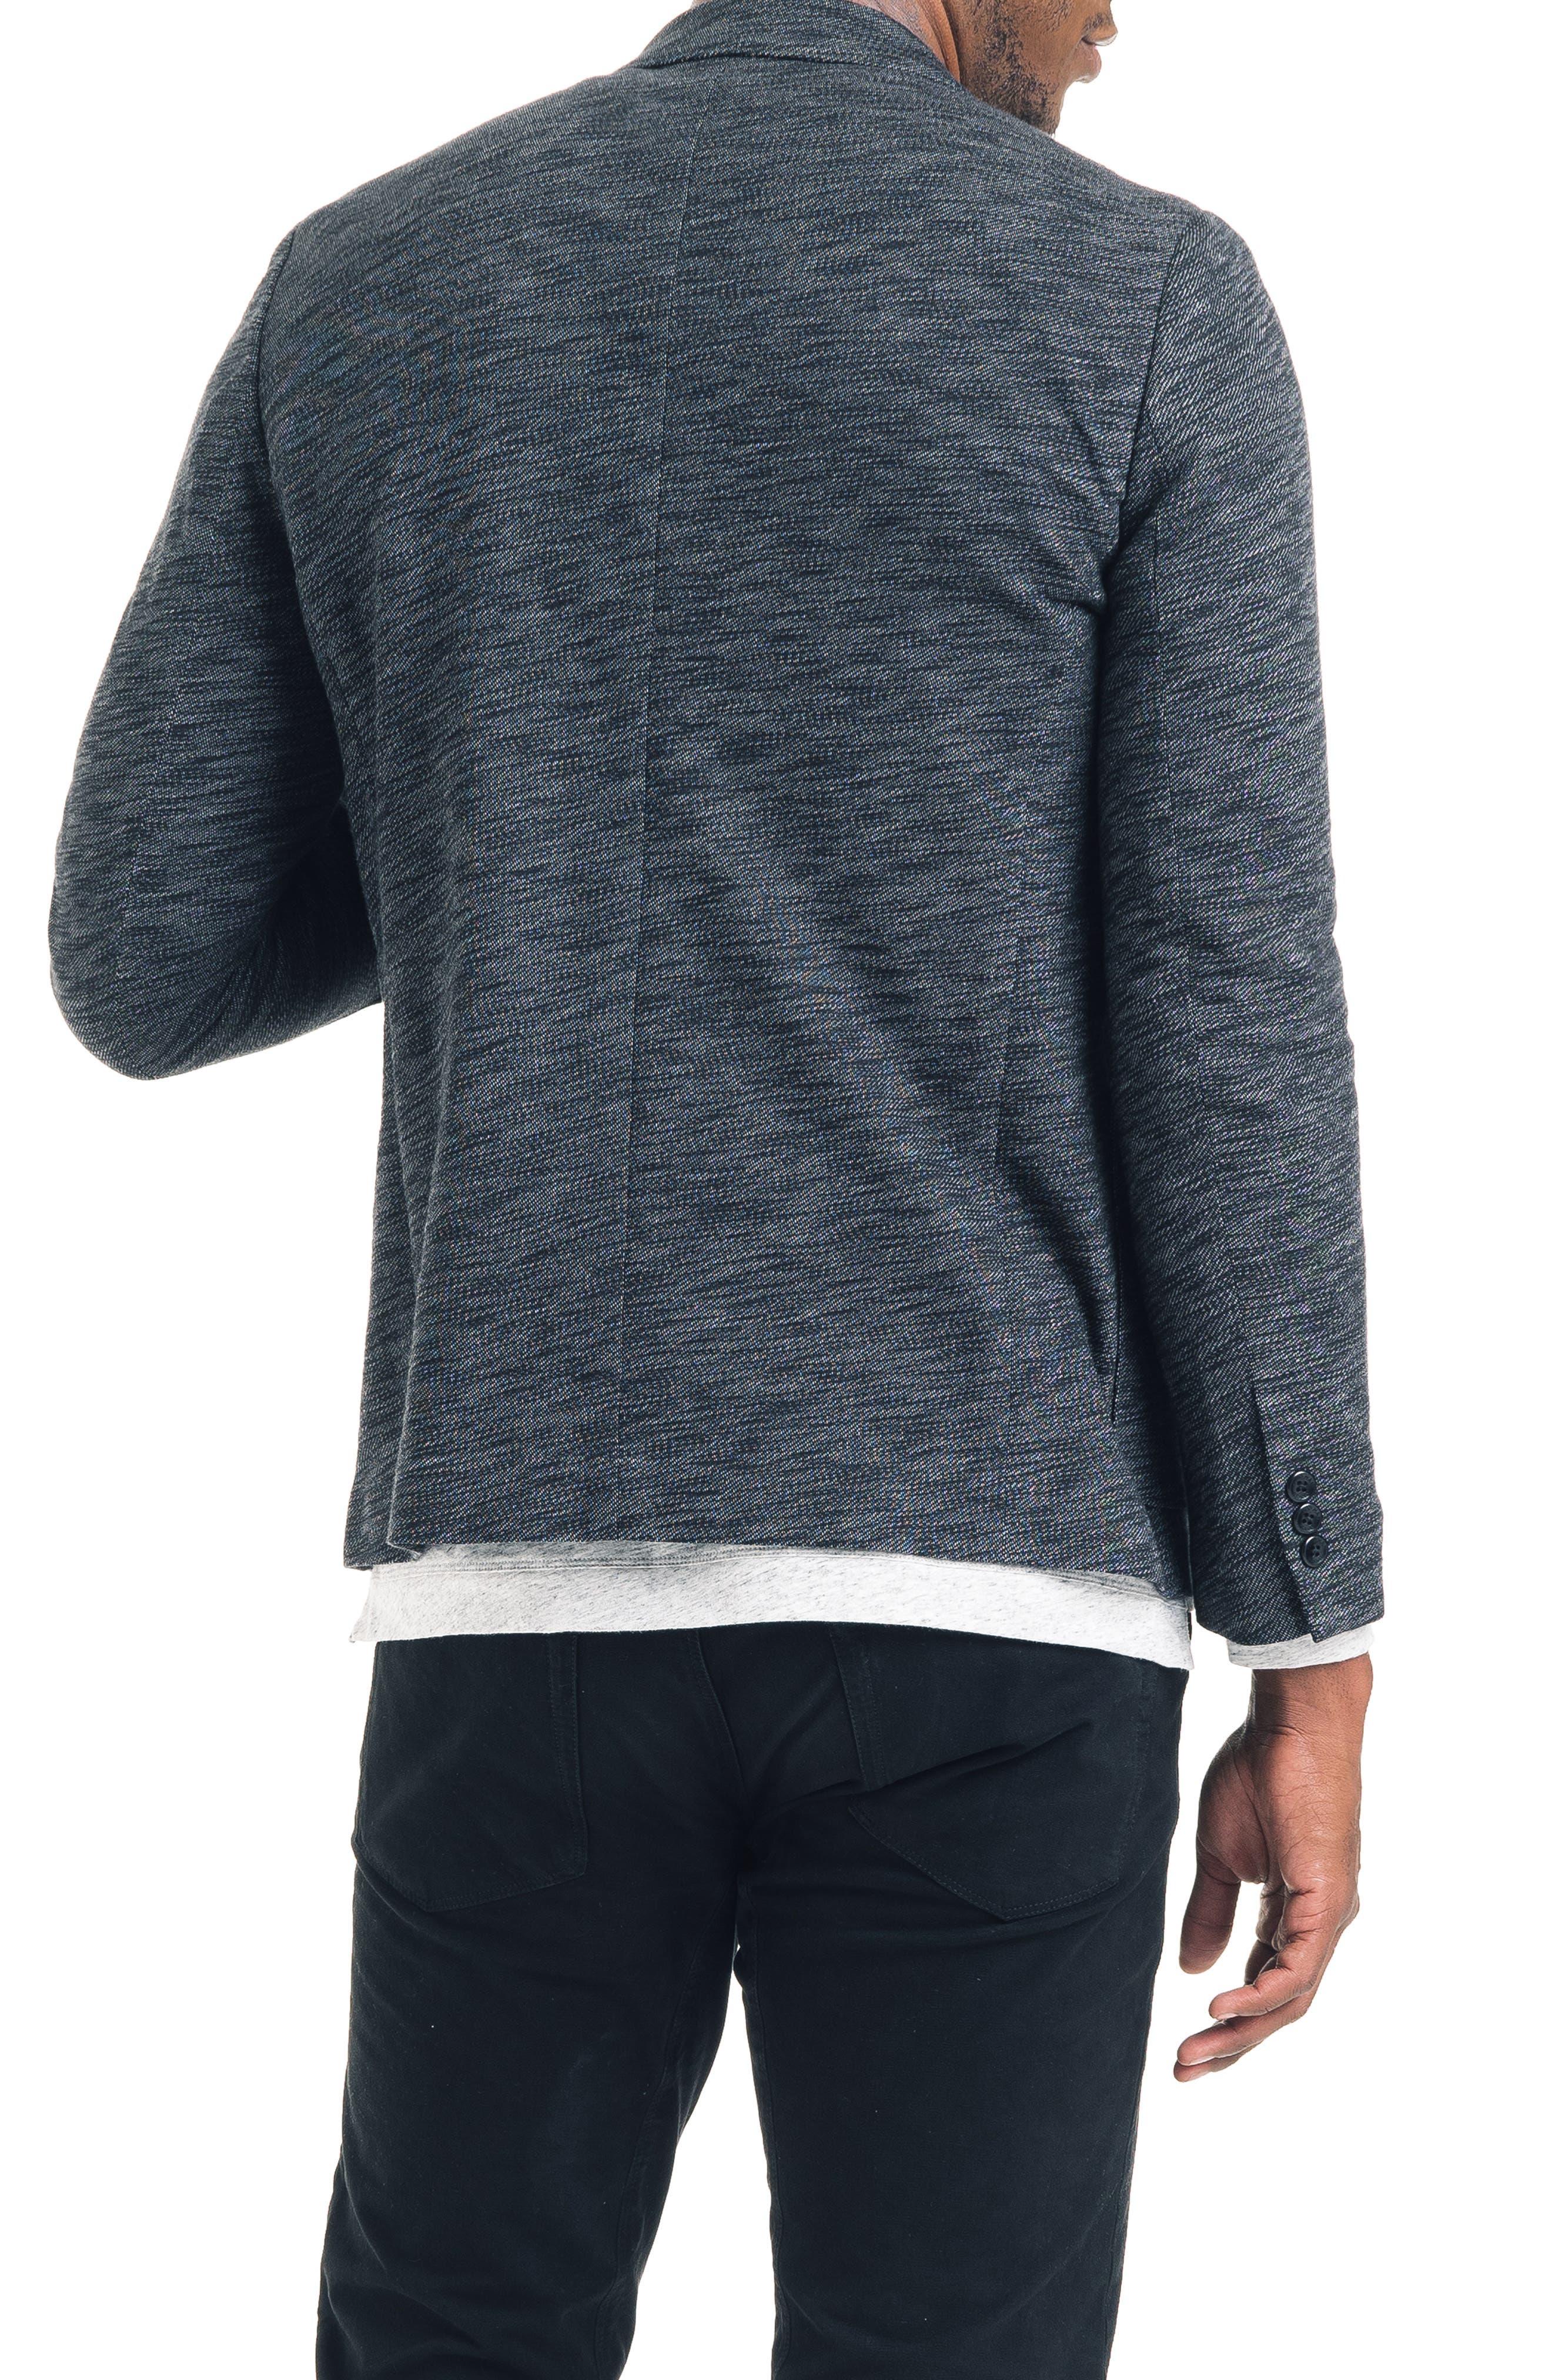 Slim Fit Vintage Twill Knit Blazer,                             Alternate thumbnail 2, color,                             BLACK / GREY HEATHER